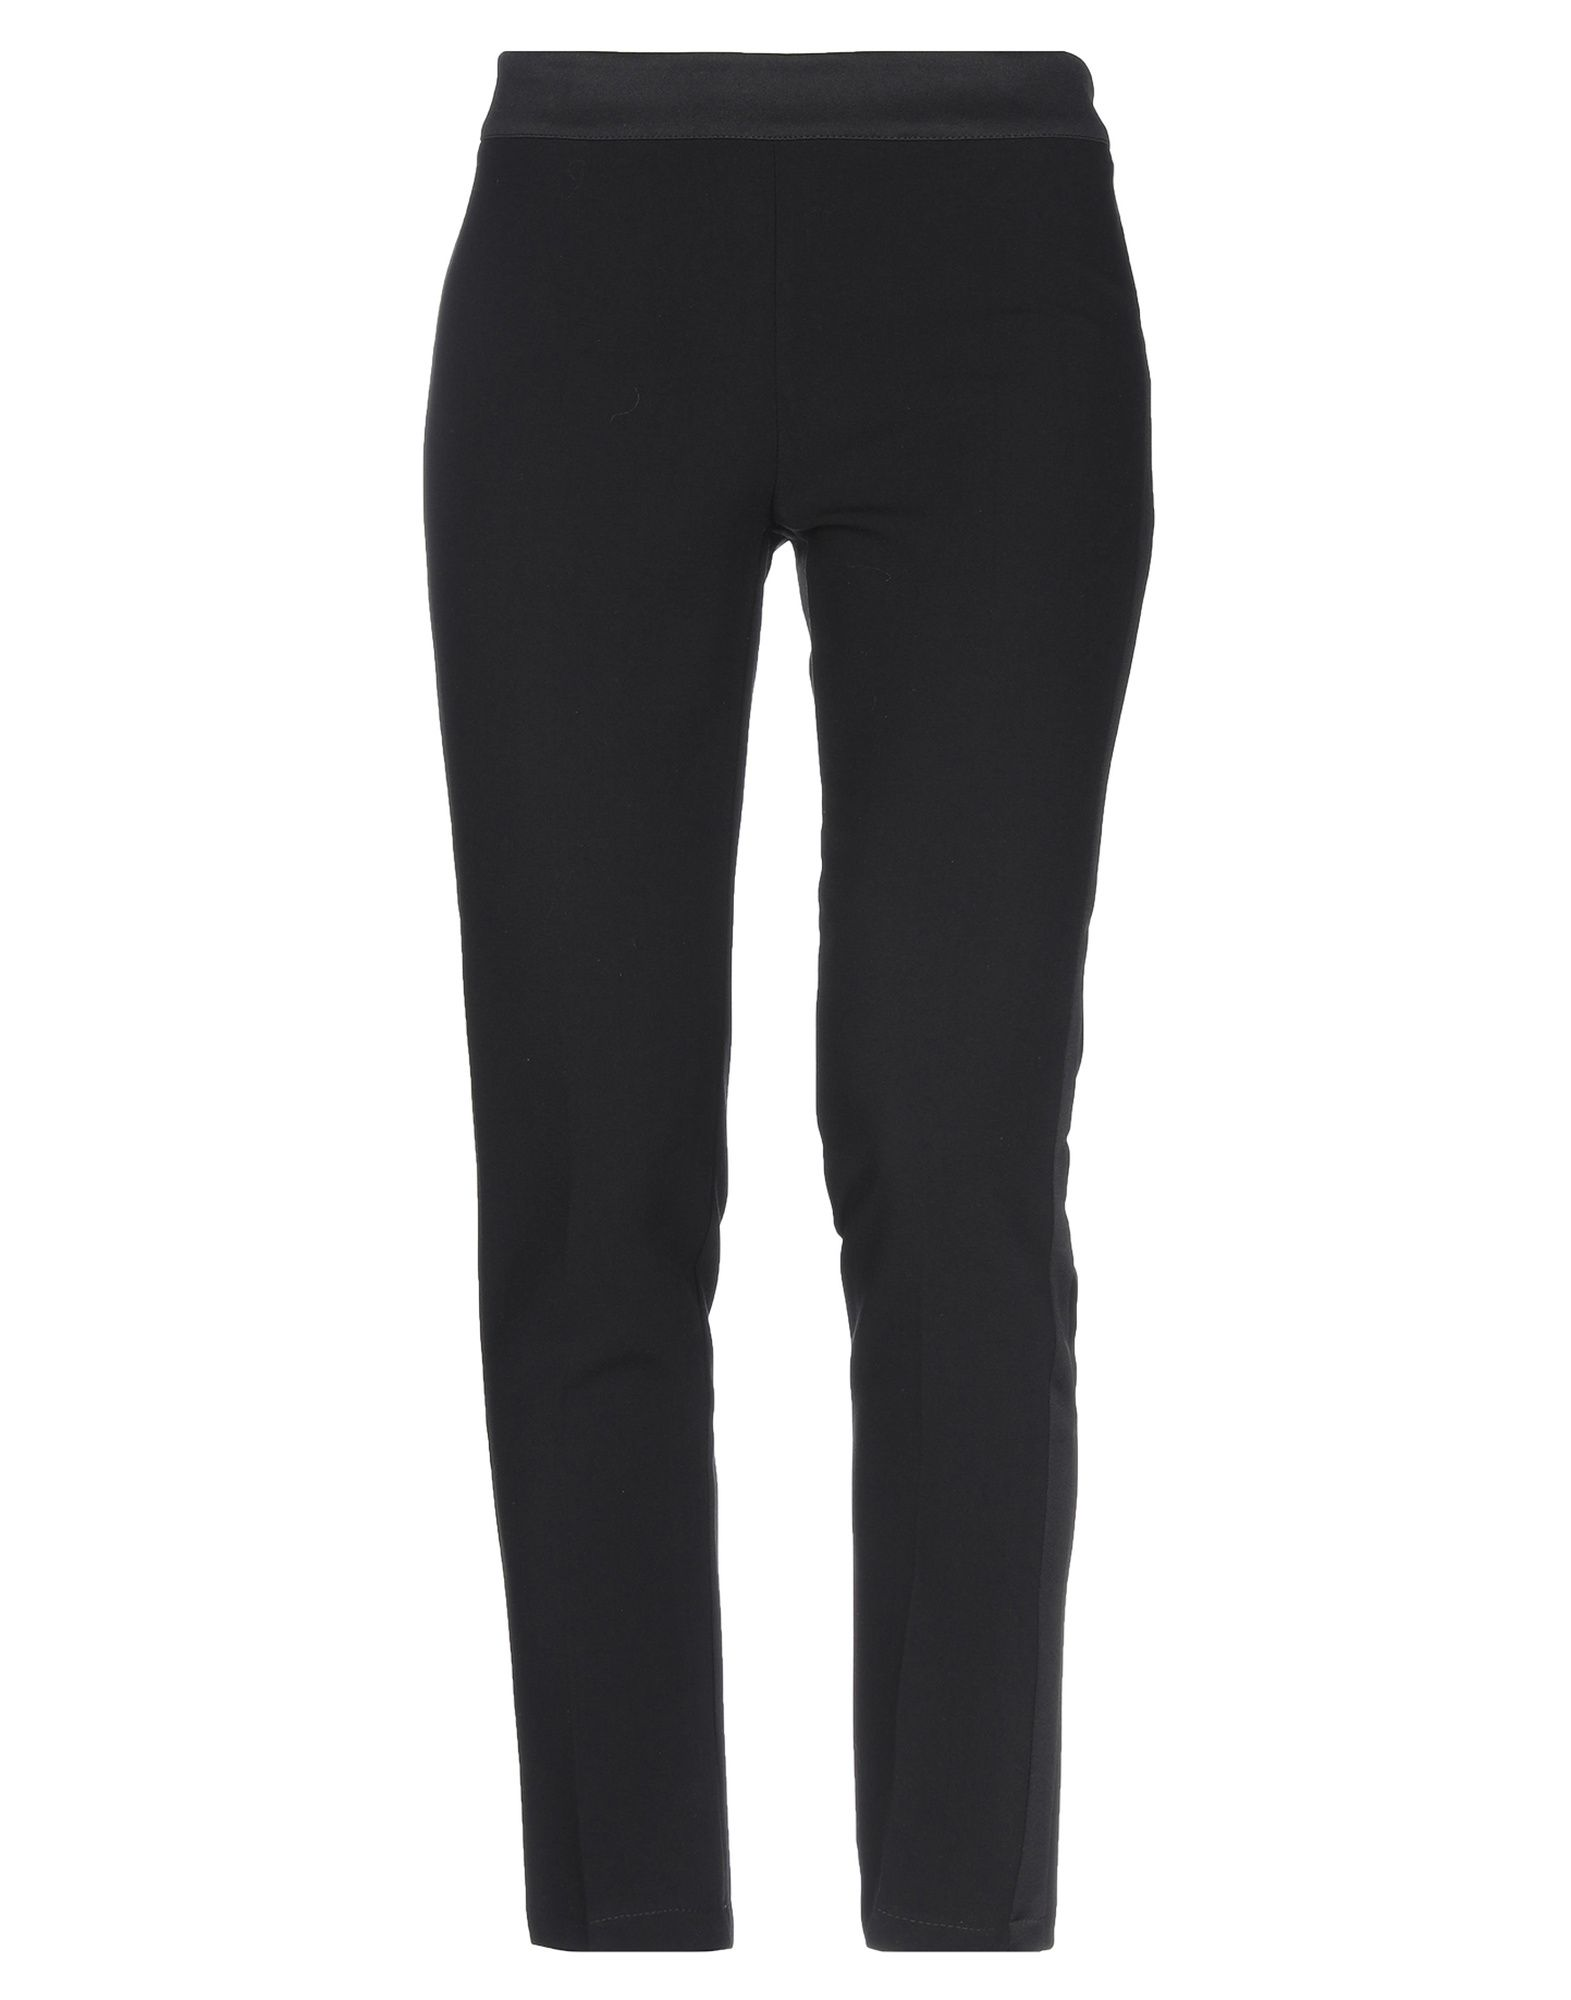 SETE DI JAIPUR Повседневные брюки